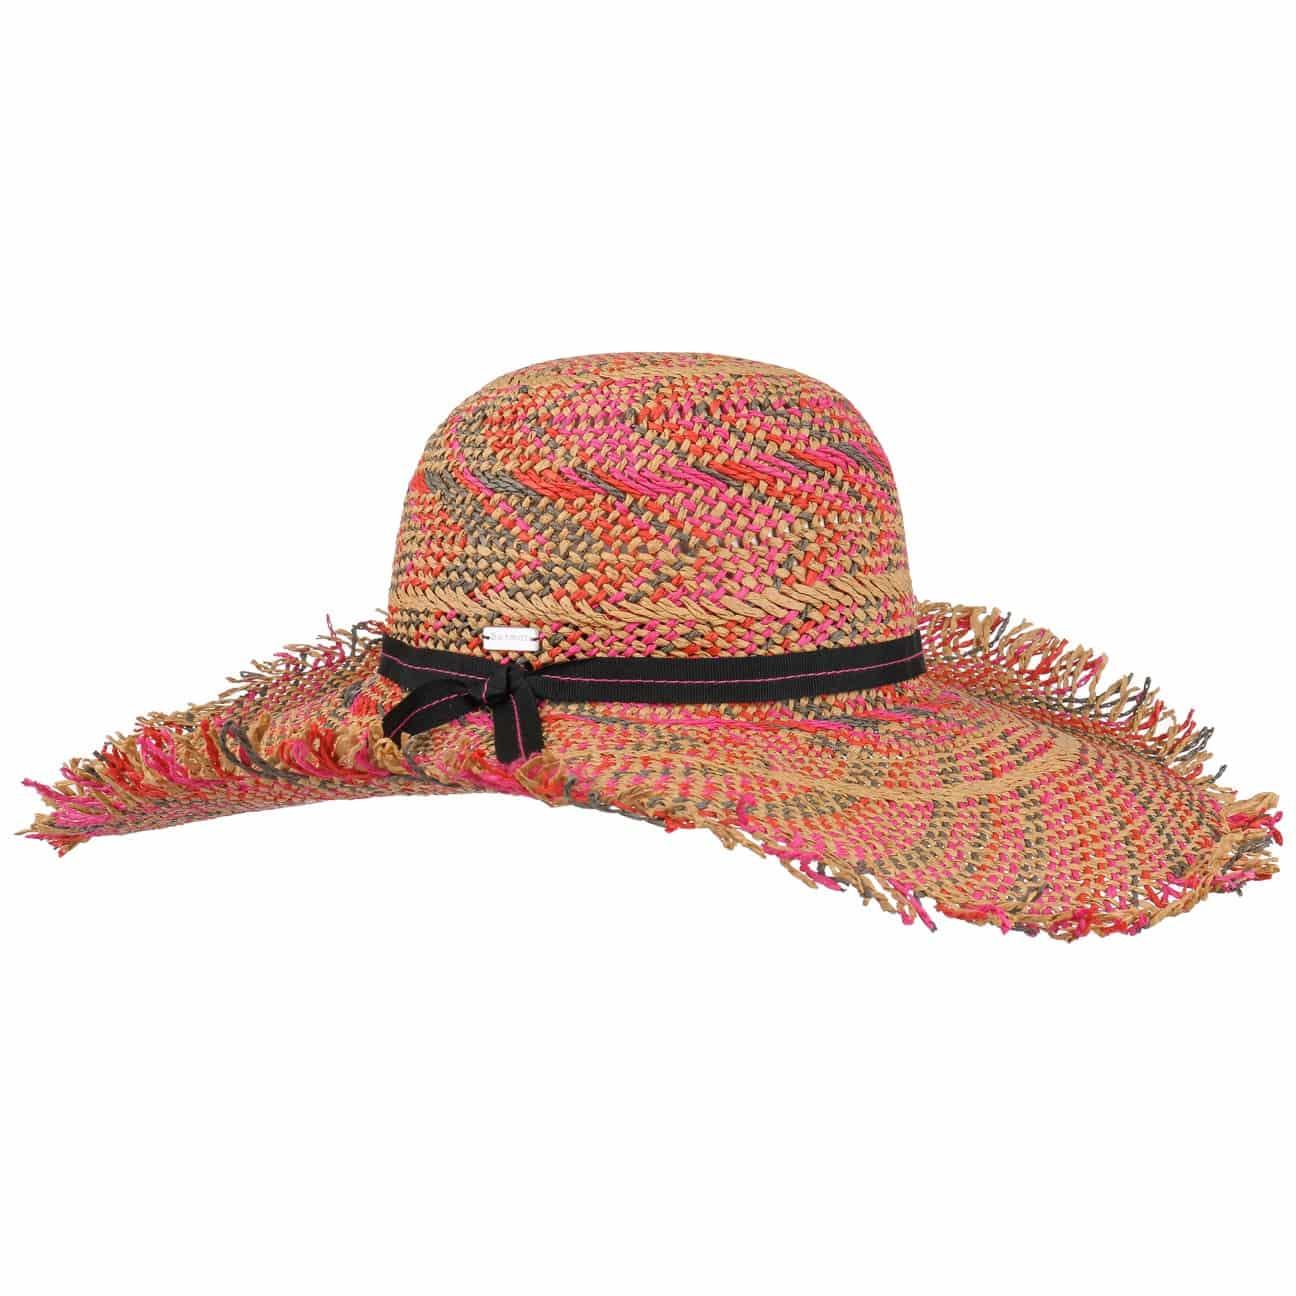 Sombrero de ala Ancha Tulum by Betmar